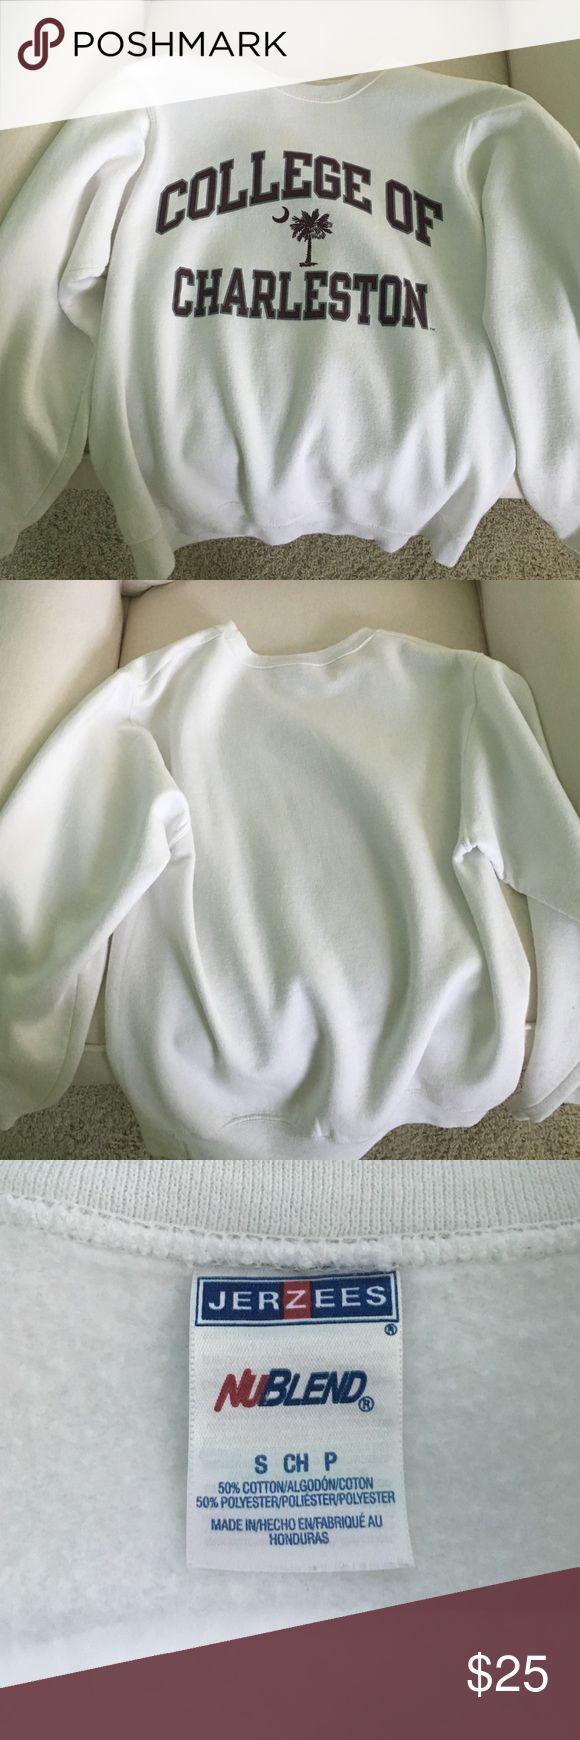 White college of Charleston crew neck sweatshirt Great condition Hardly worn white sweat shirt Jackets & Coats